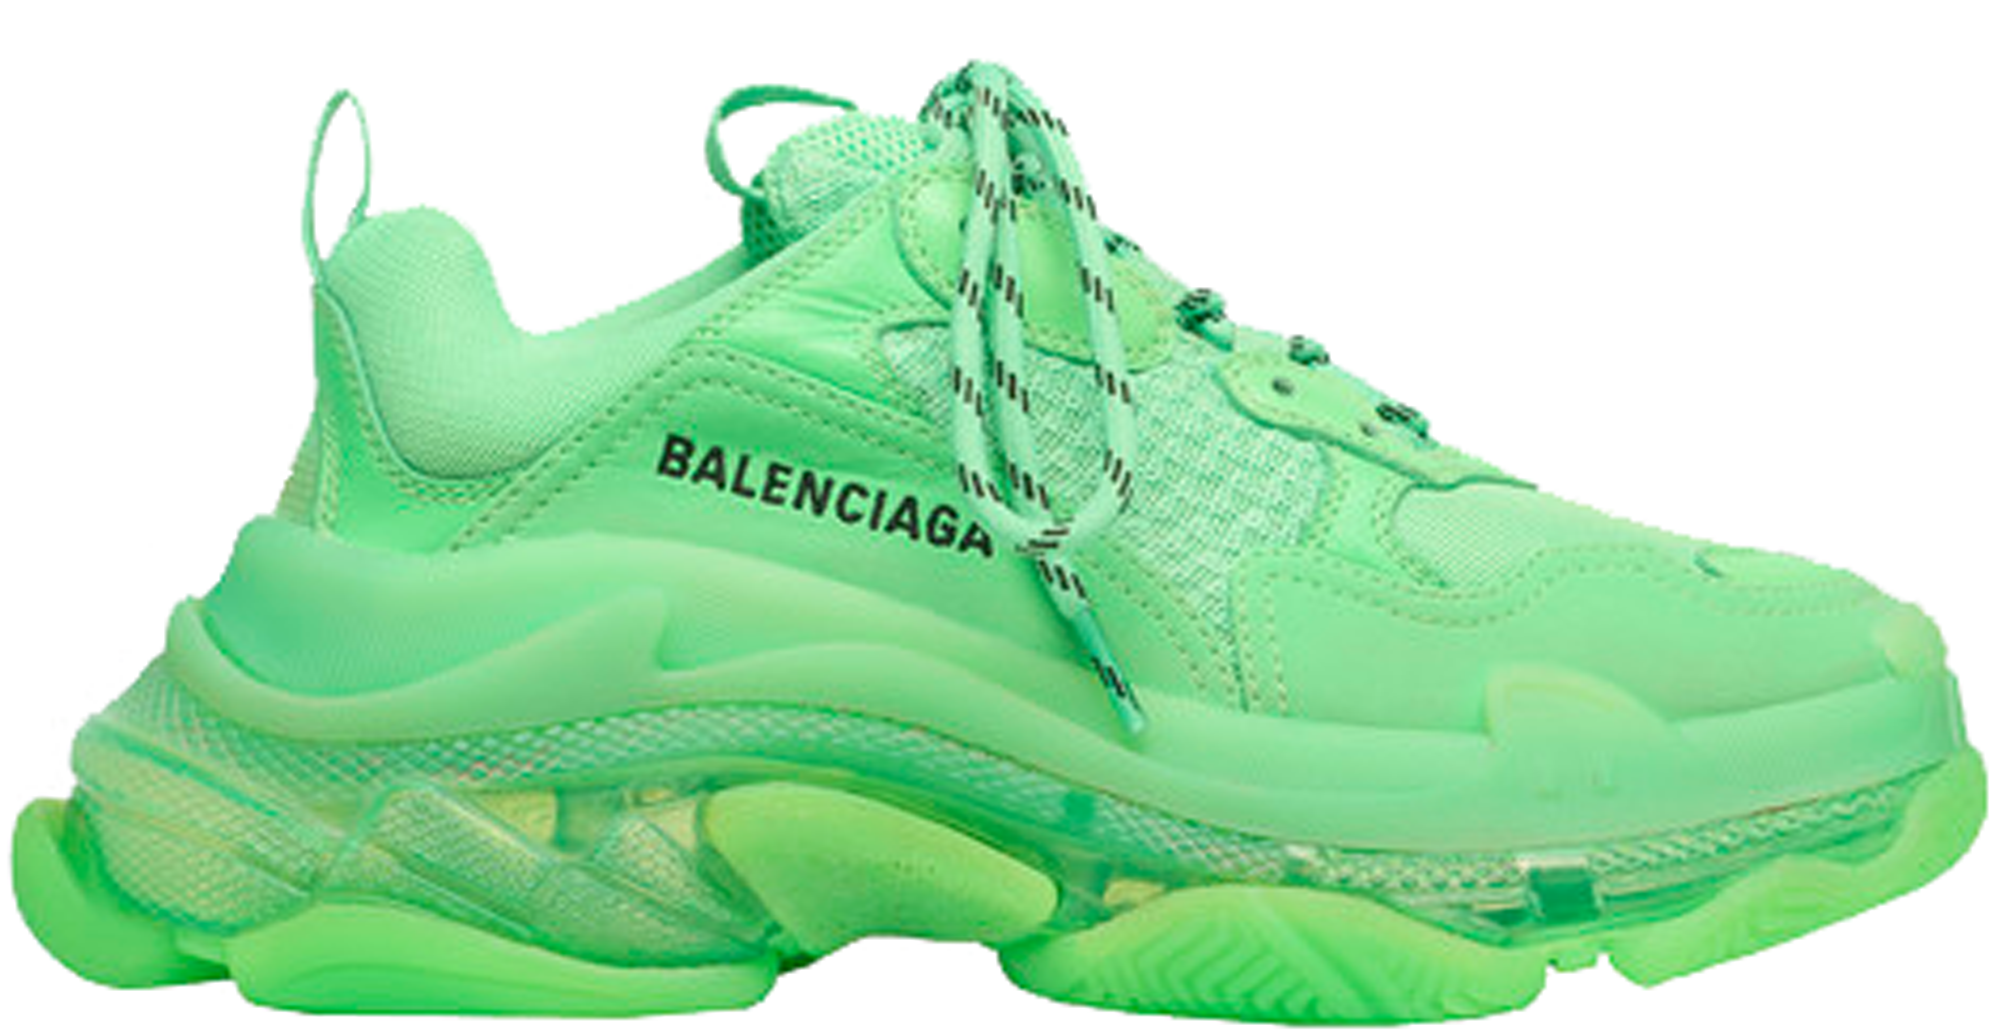 Balenciaga Triple S Neon Green Clear Sole (W)